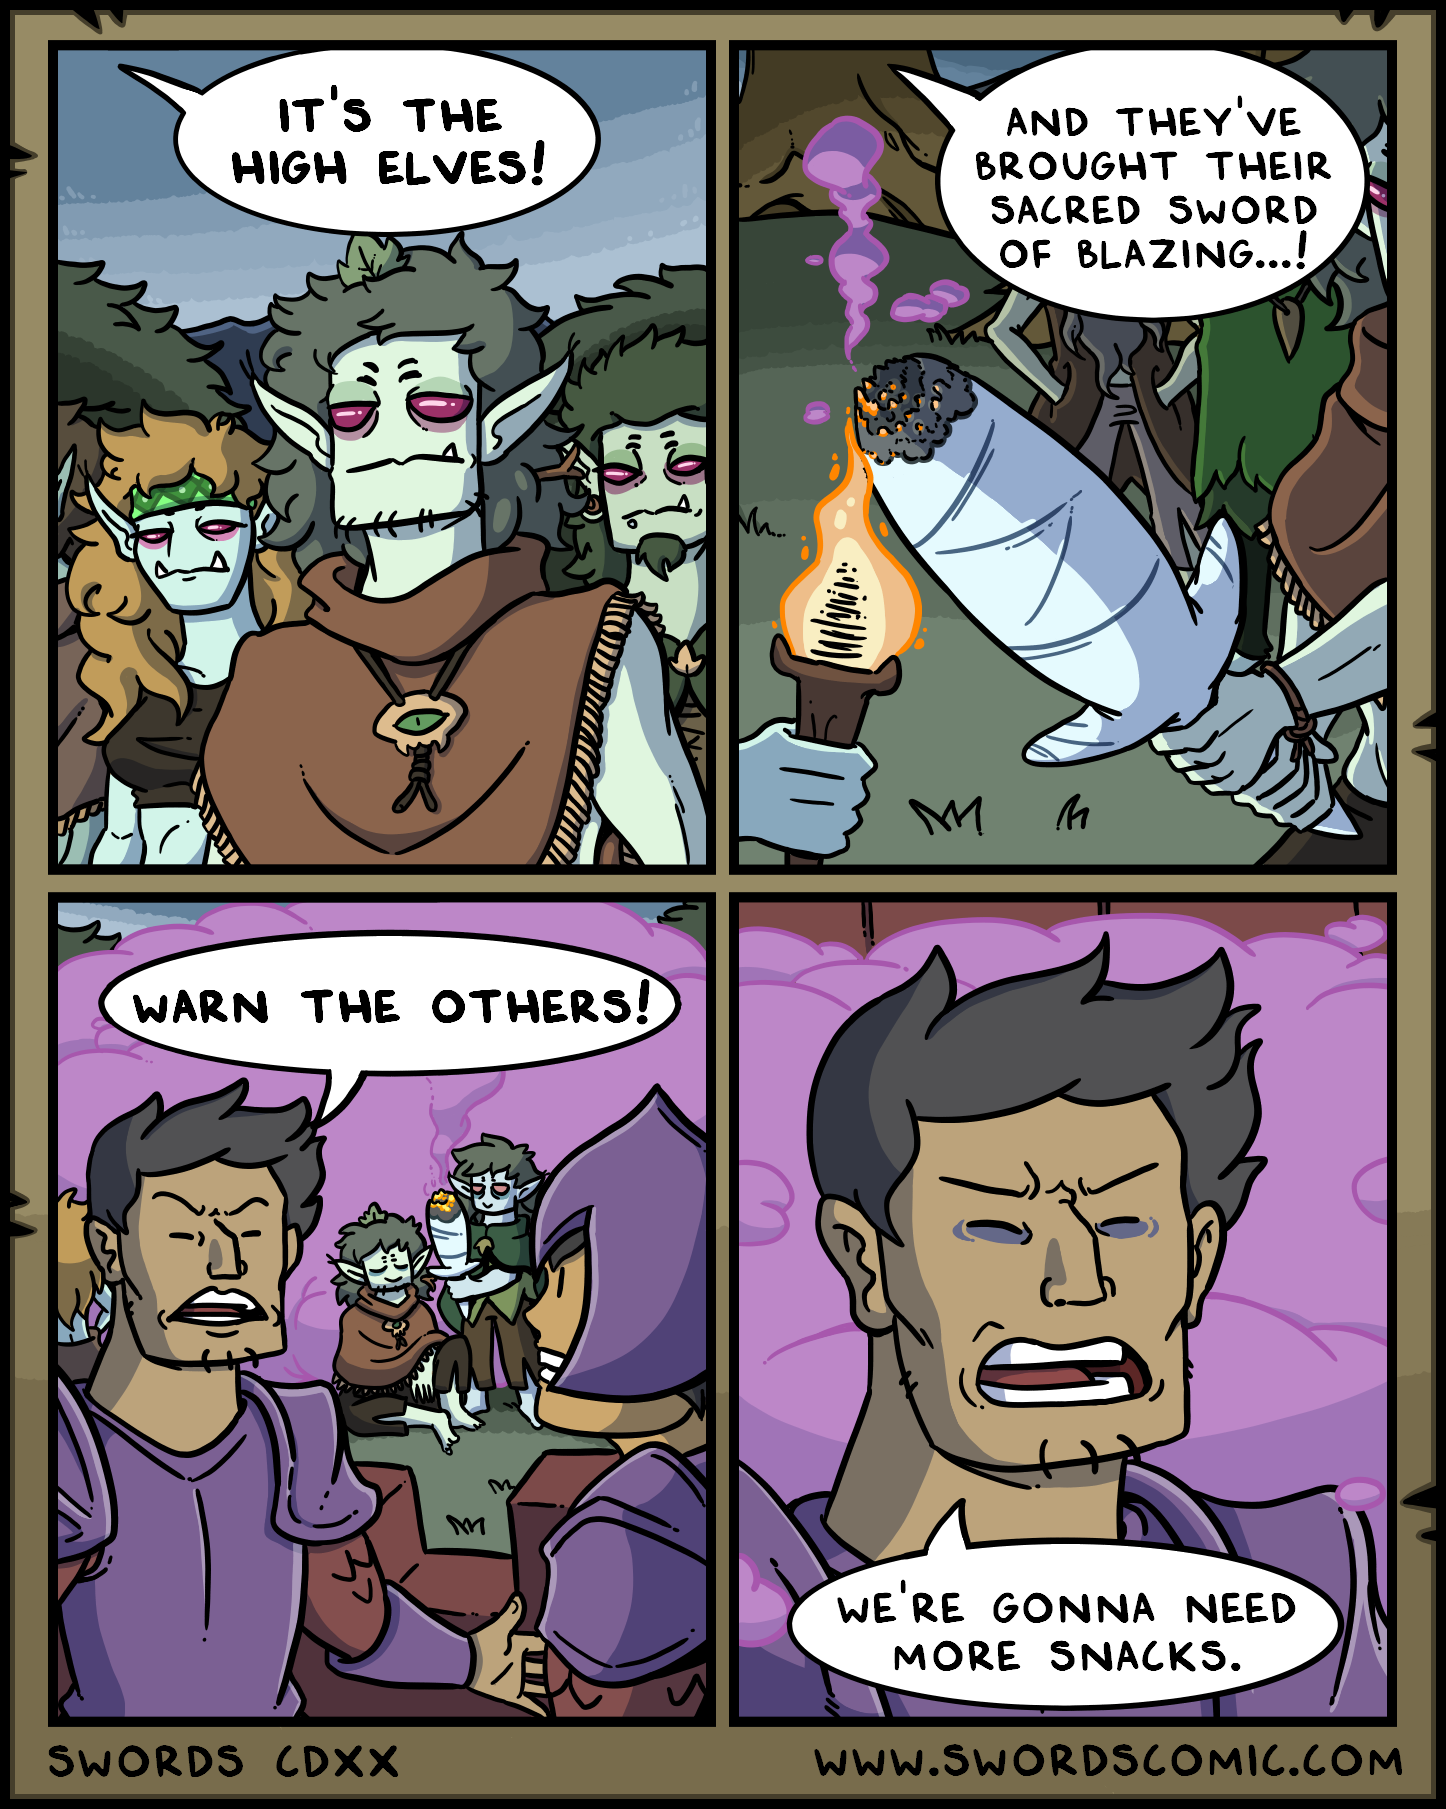 The High Elves